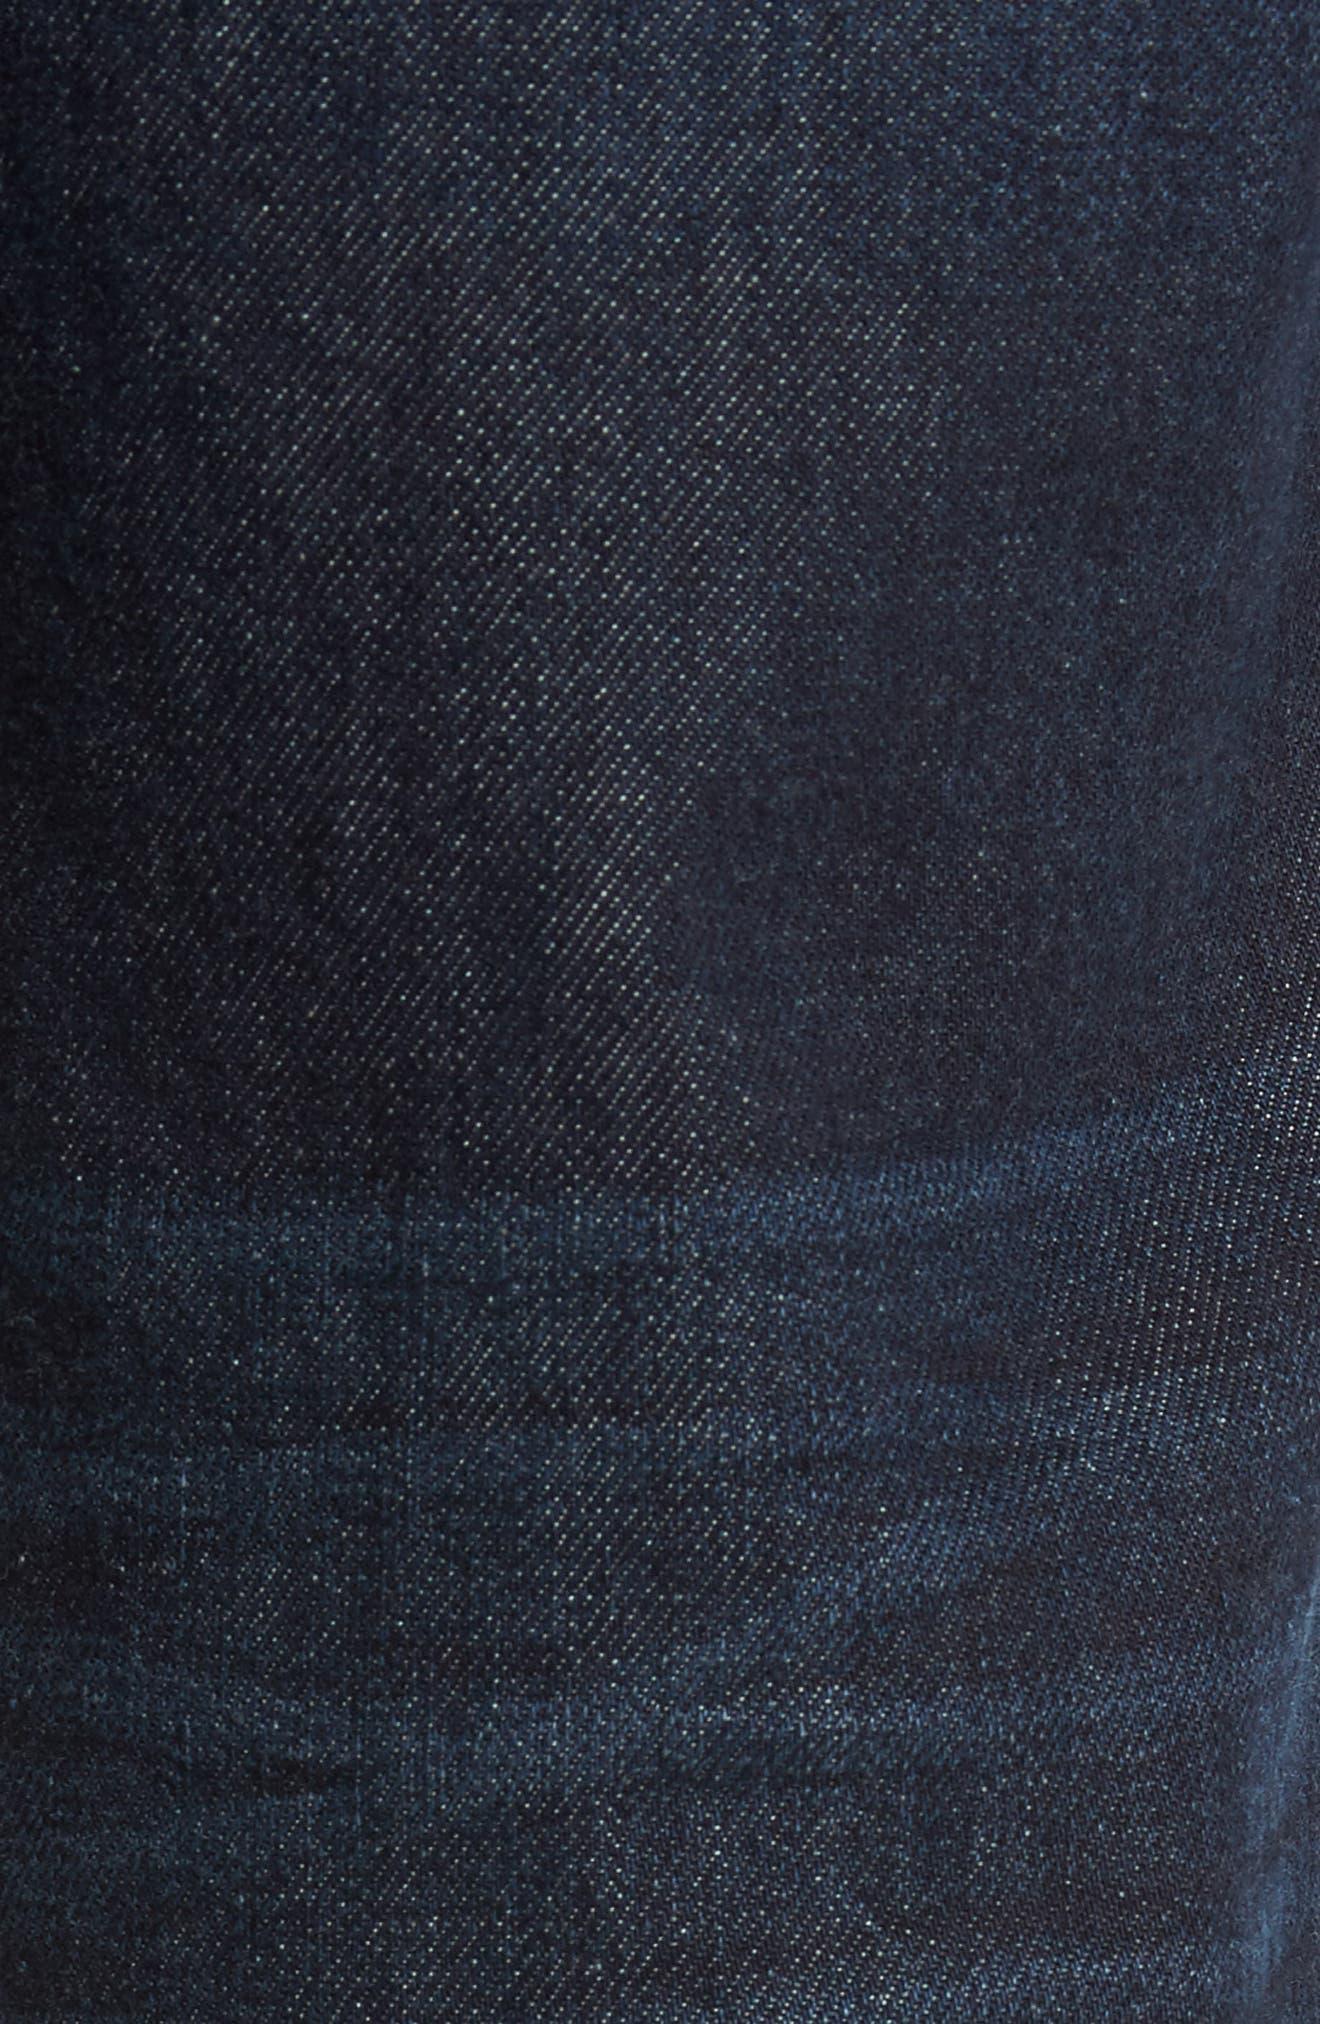 Brixton Slim Straight Leg Jeans,                             Alternate thumbnail 5, color,                             415